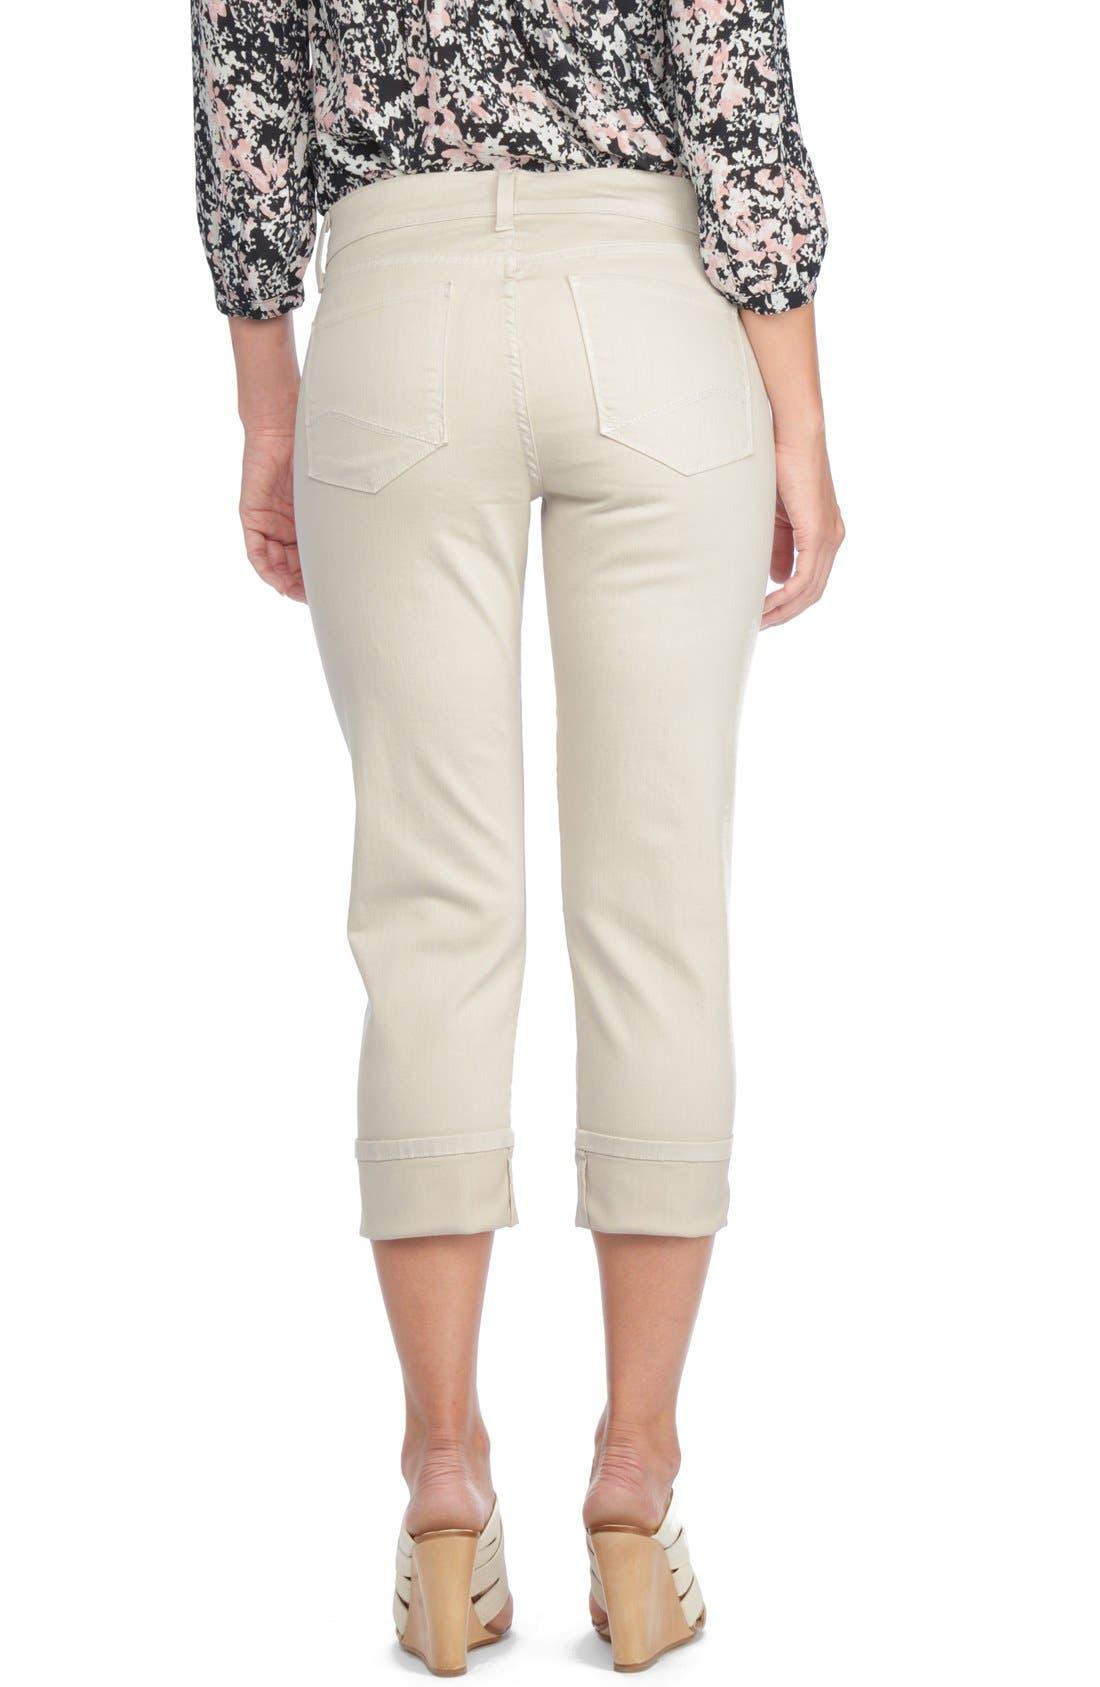 'Dayla' Colored Wide Cuff Capri Jeans,                             Alternate thumbnail 32, color,